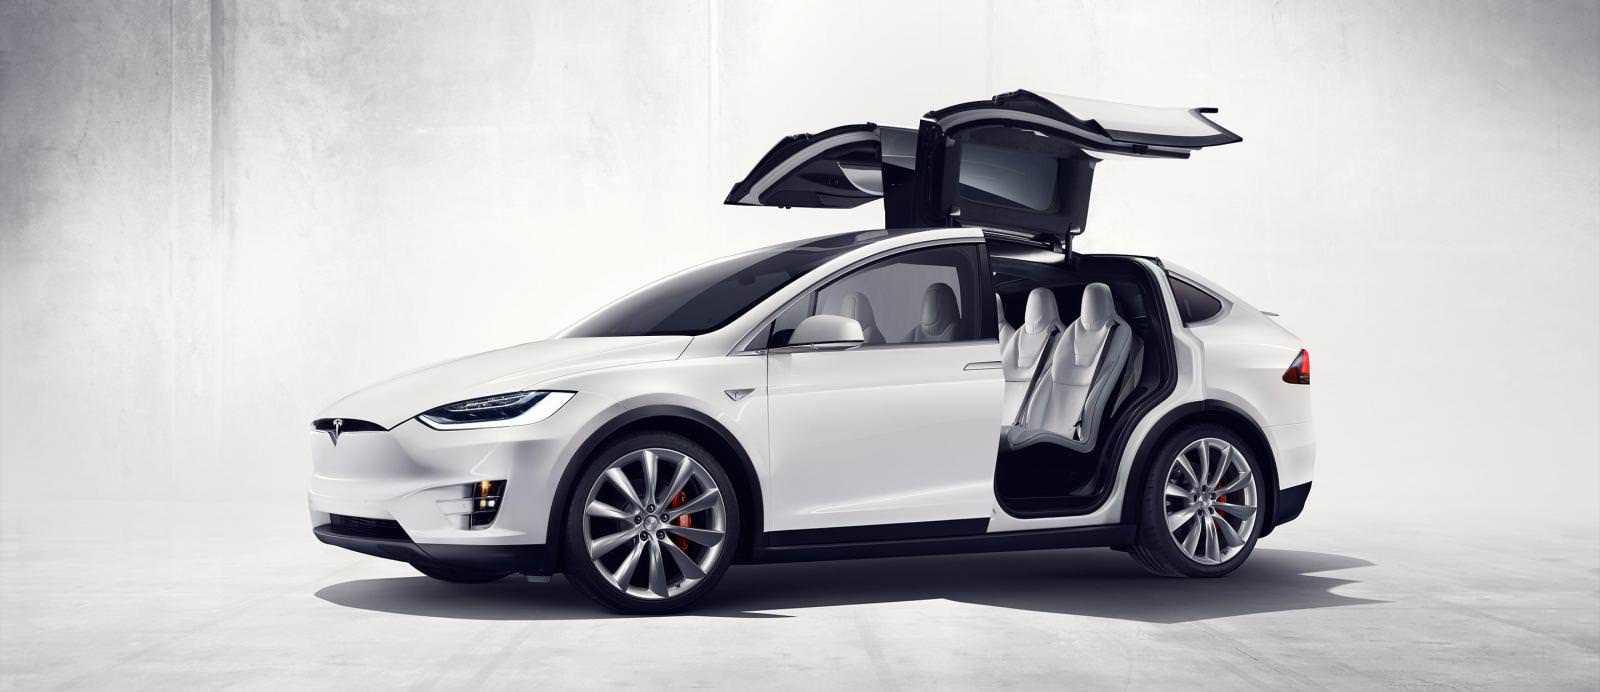 سيارة تيسلا X 2016